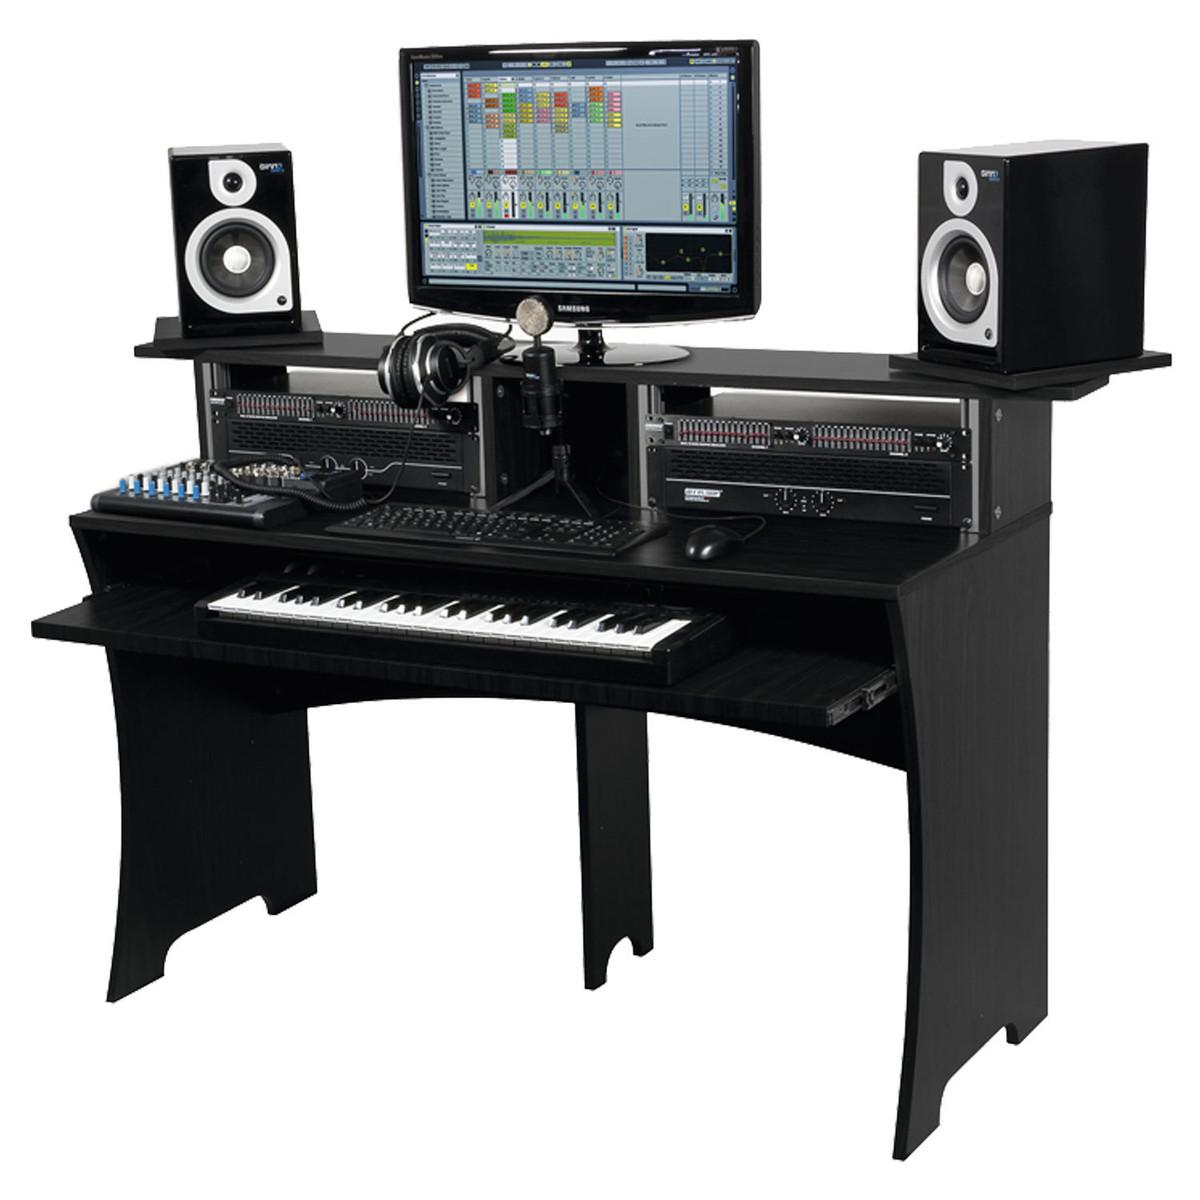 www.gear4music.com